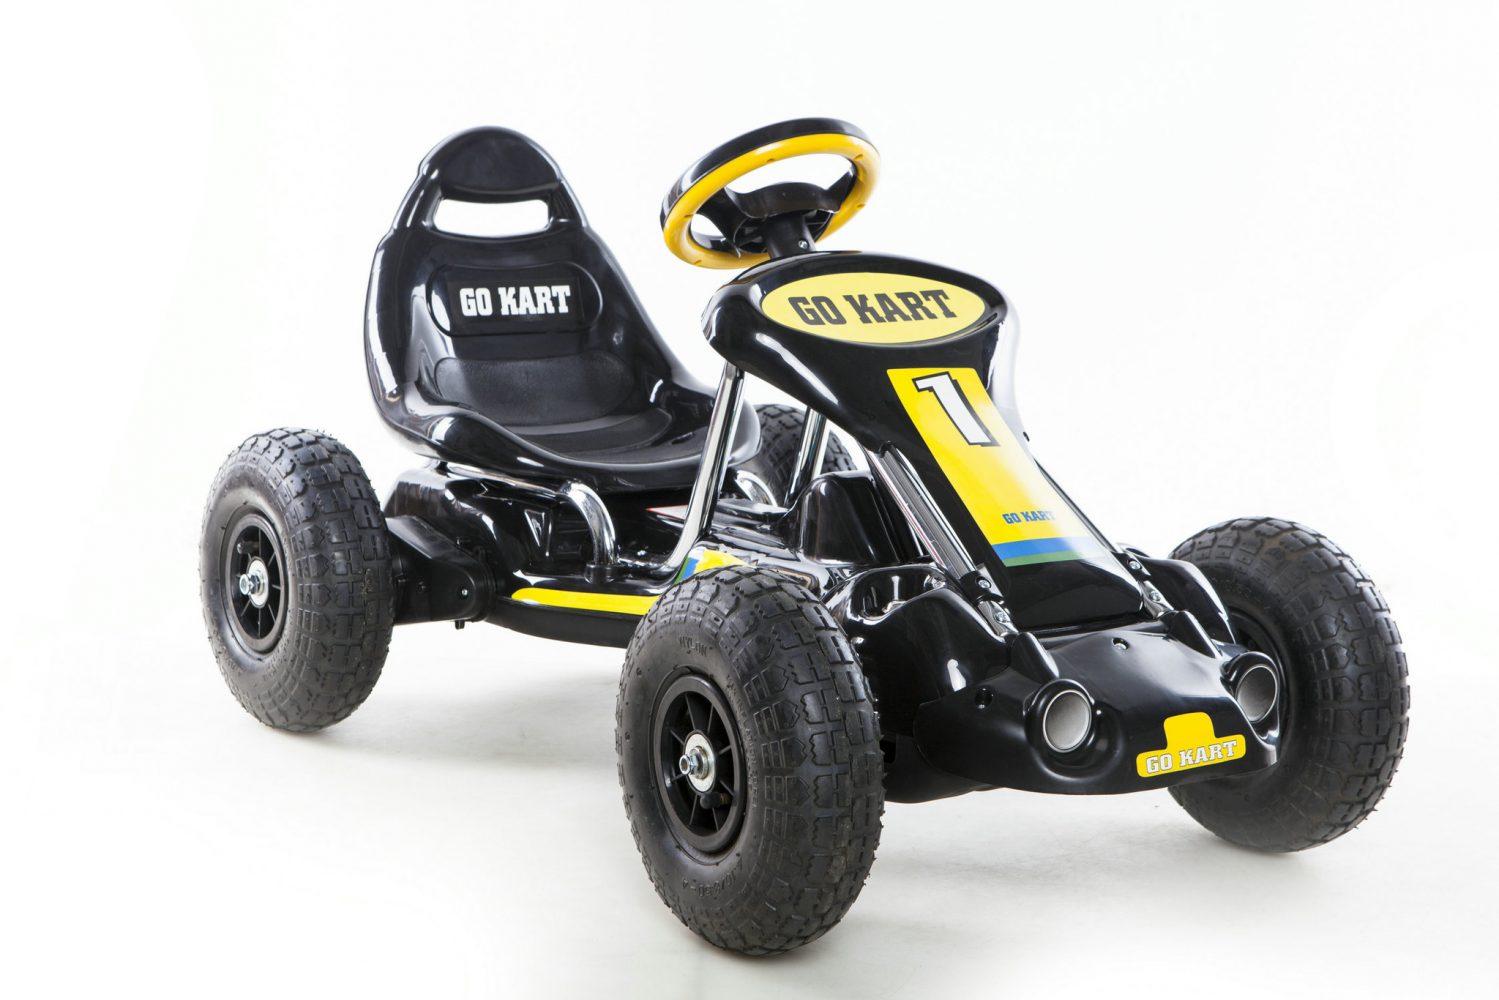 Battery powered Kart